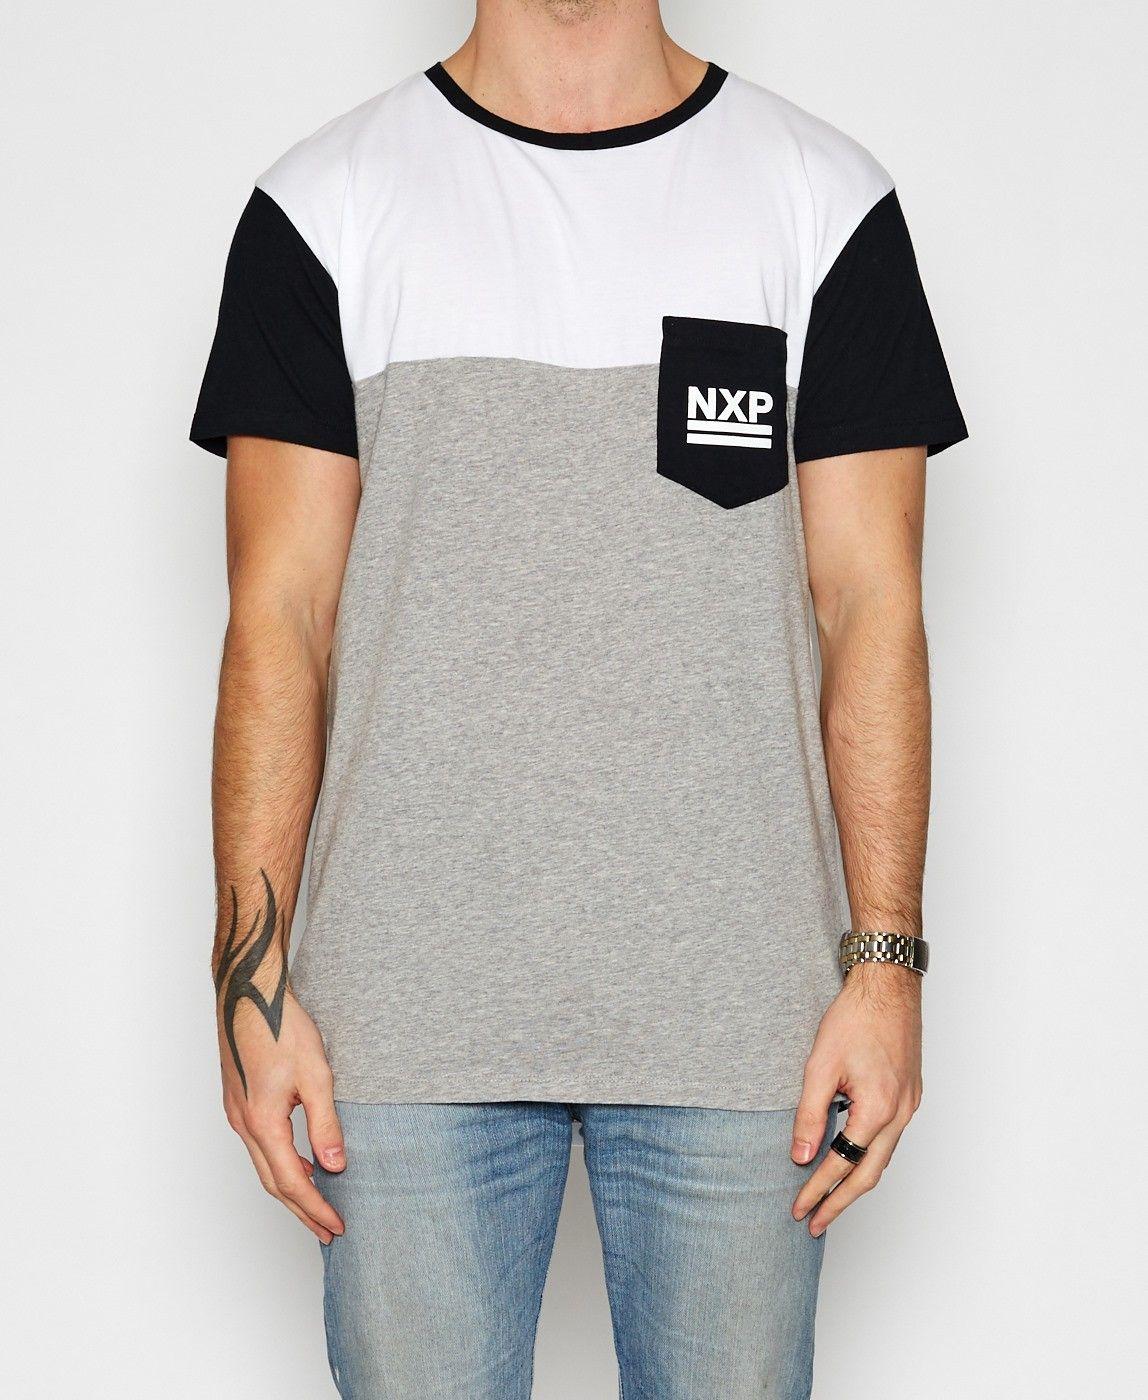 Nena & Pasadena / Interstellar Scoop Back T-Shirt White/Black T-Shirts Tops Men | Neverland Store